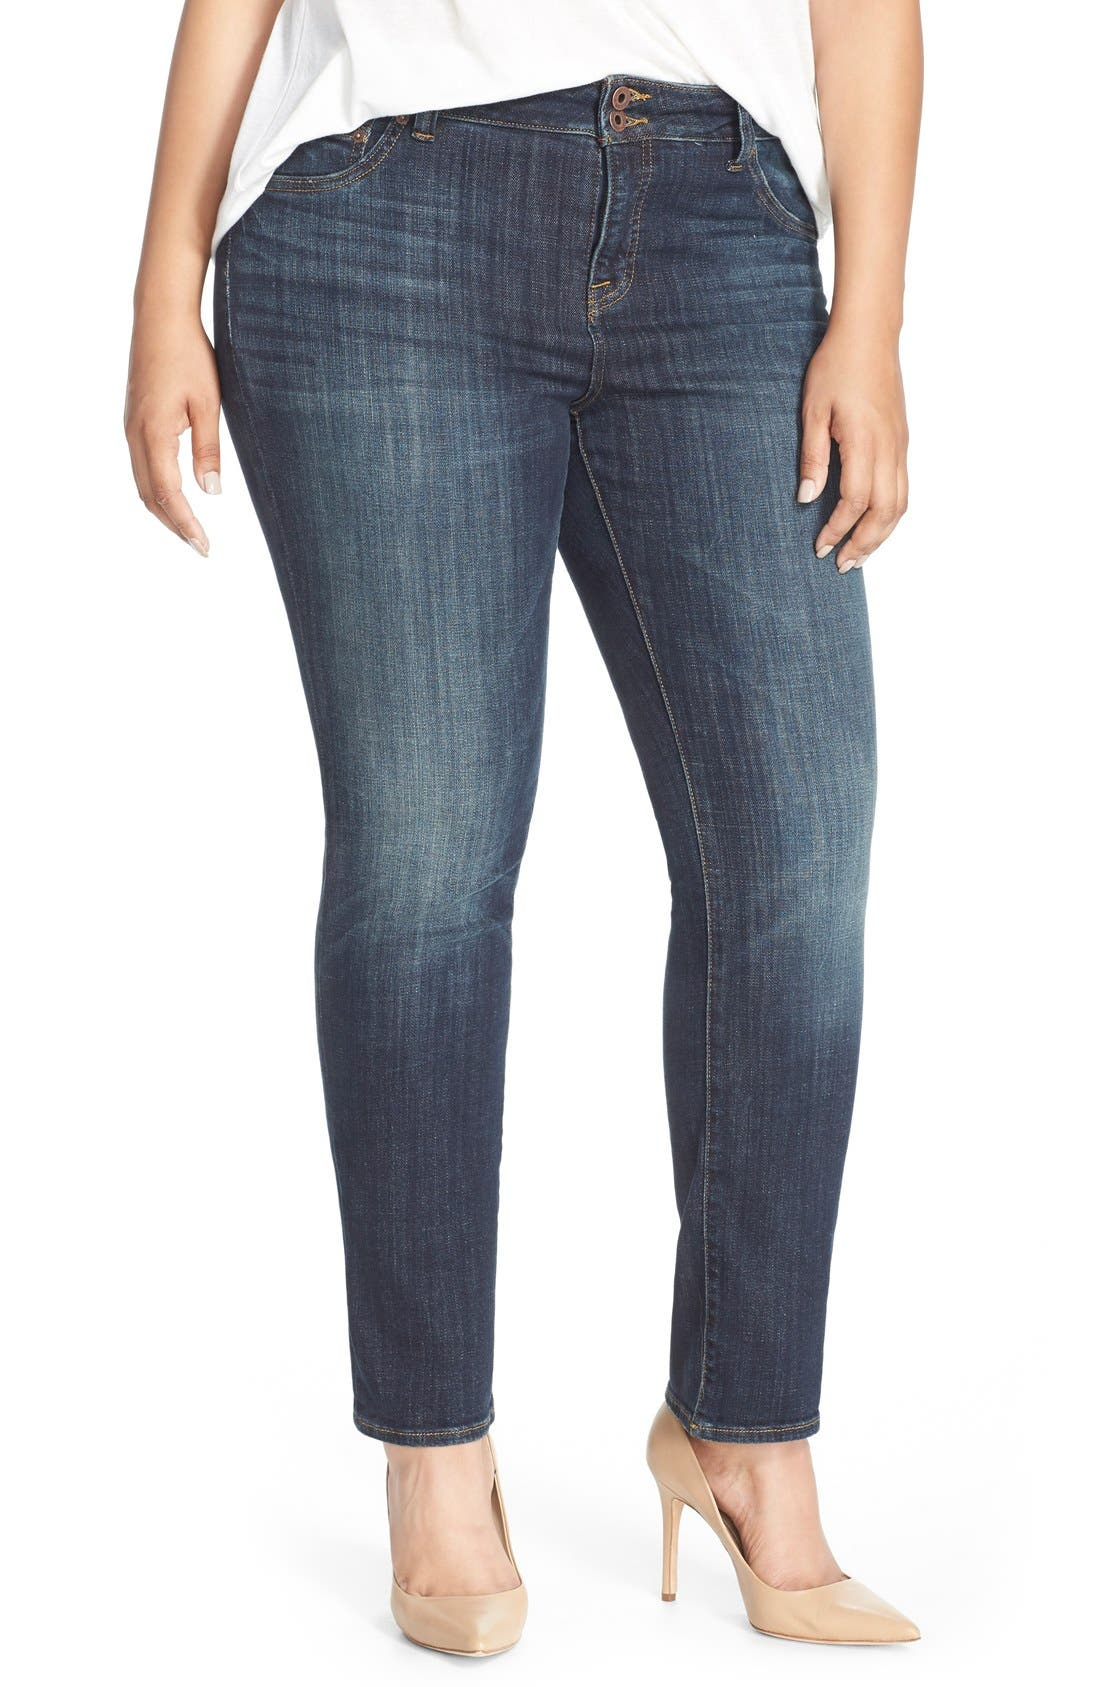 LUCKY BRAND, Emma High Rise Stretch Straight Leg Jeans, Main thumbnail 1, color, TIBURON